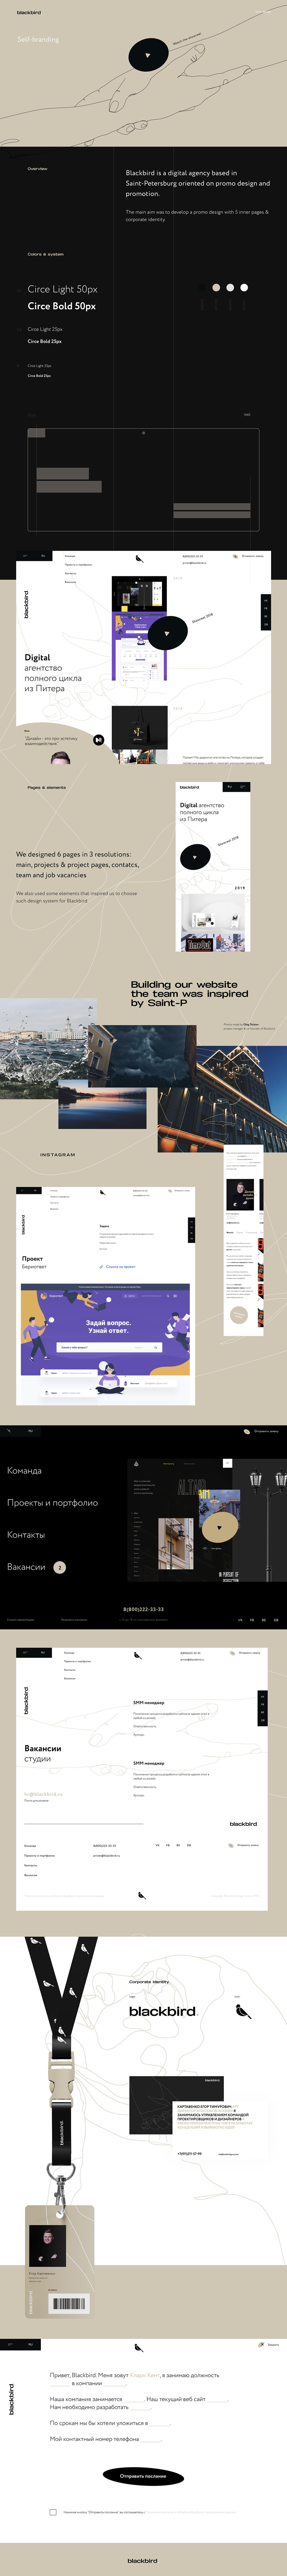 UI UX design Web Design  blackbird Egor Kartavenko identity agency